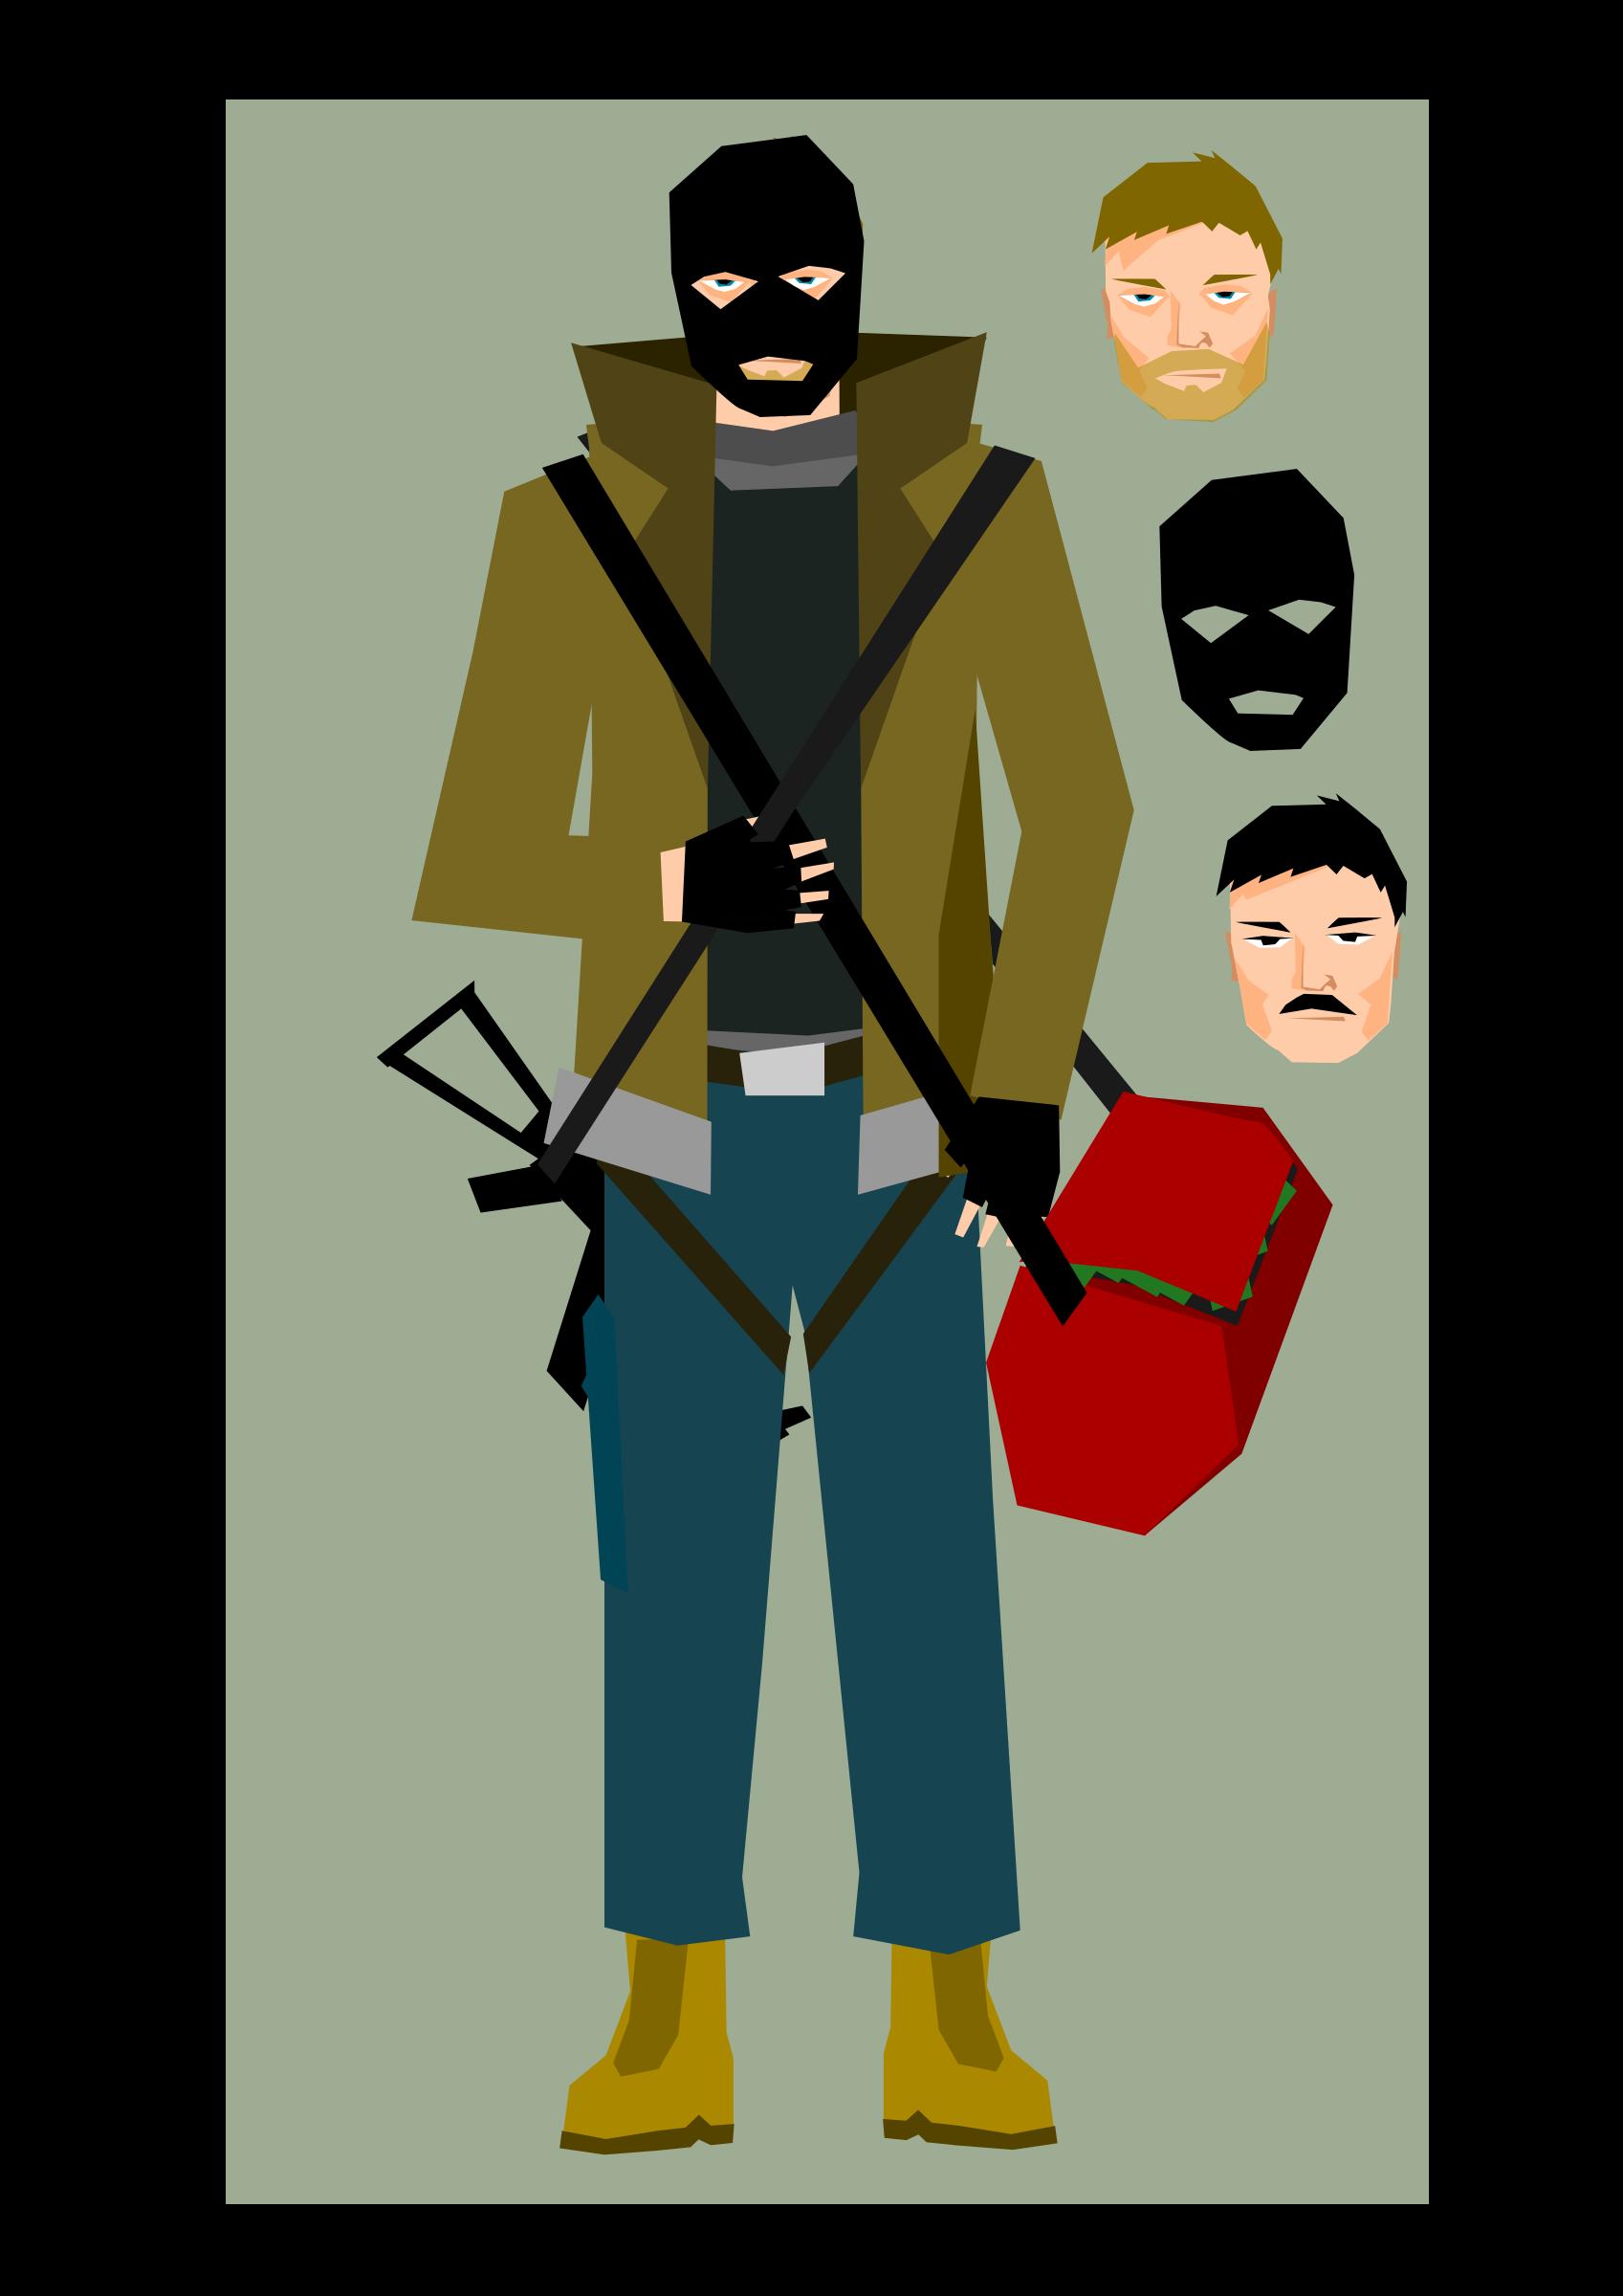 Big image png. Clipart bank robber